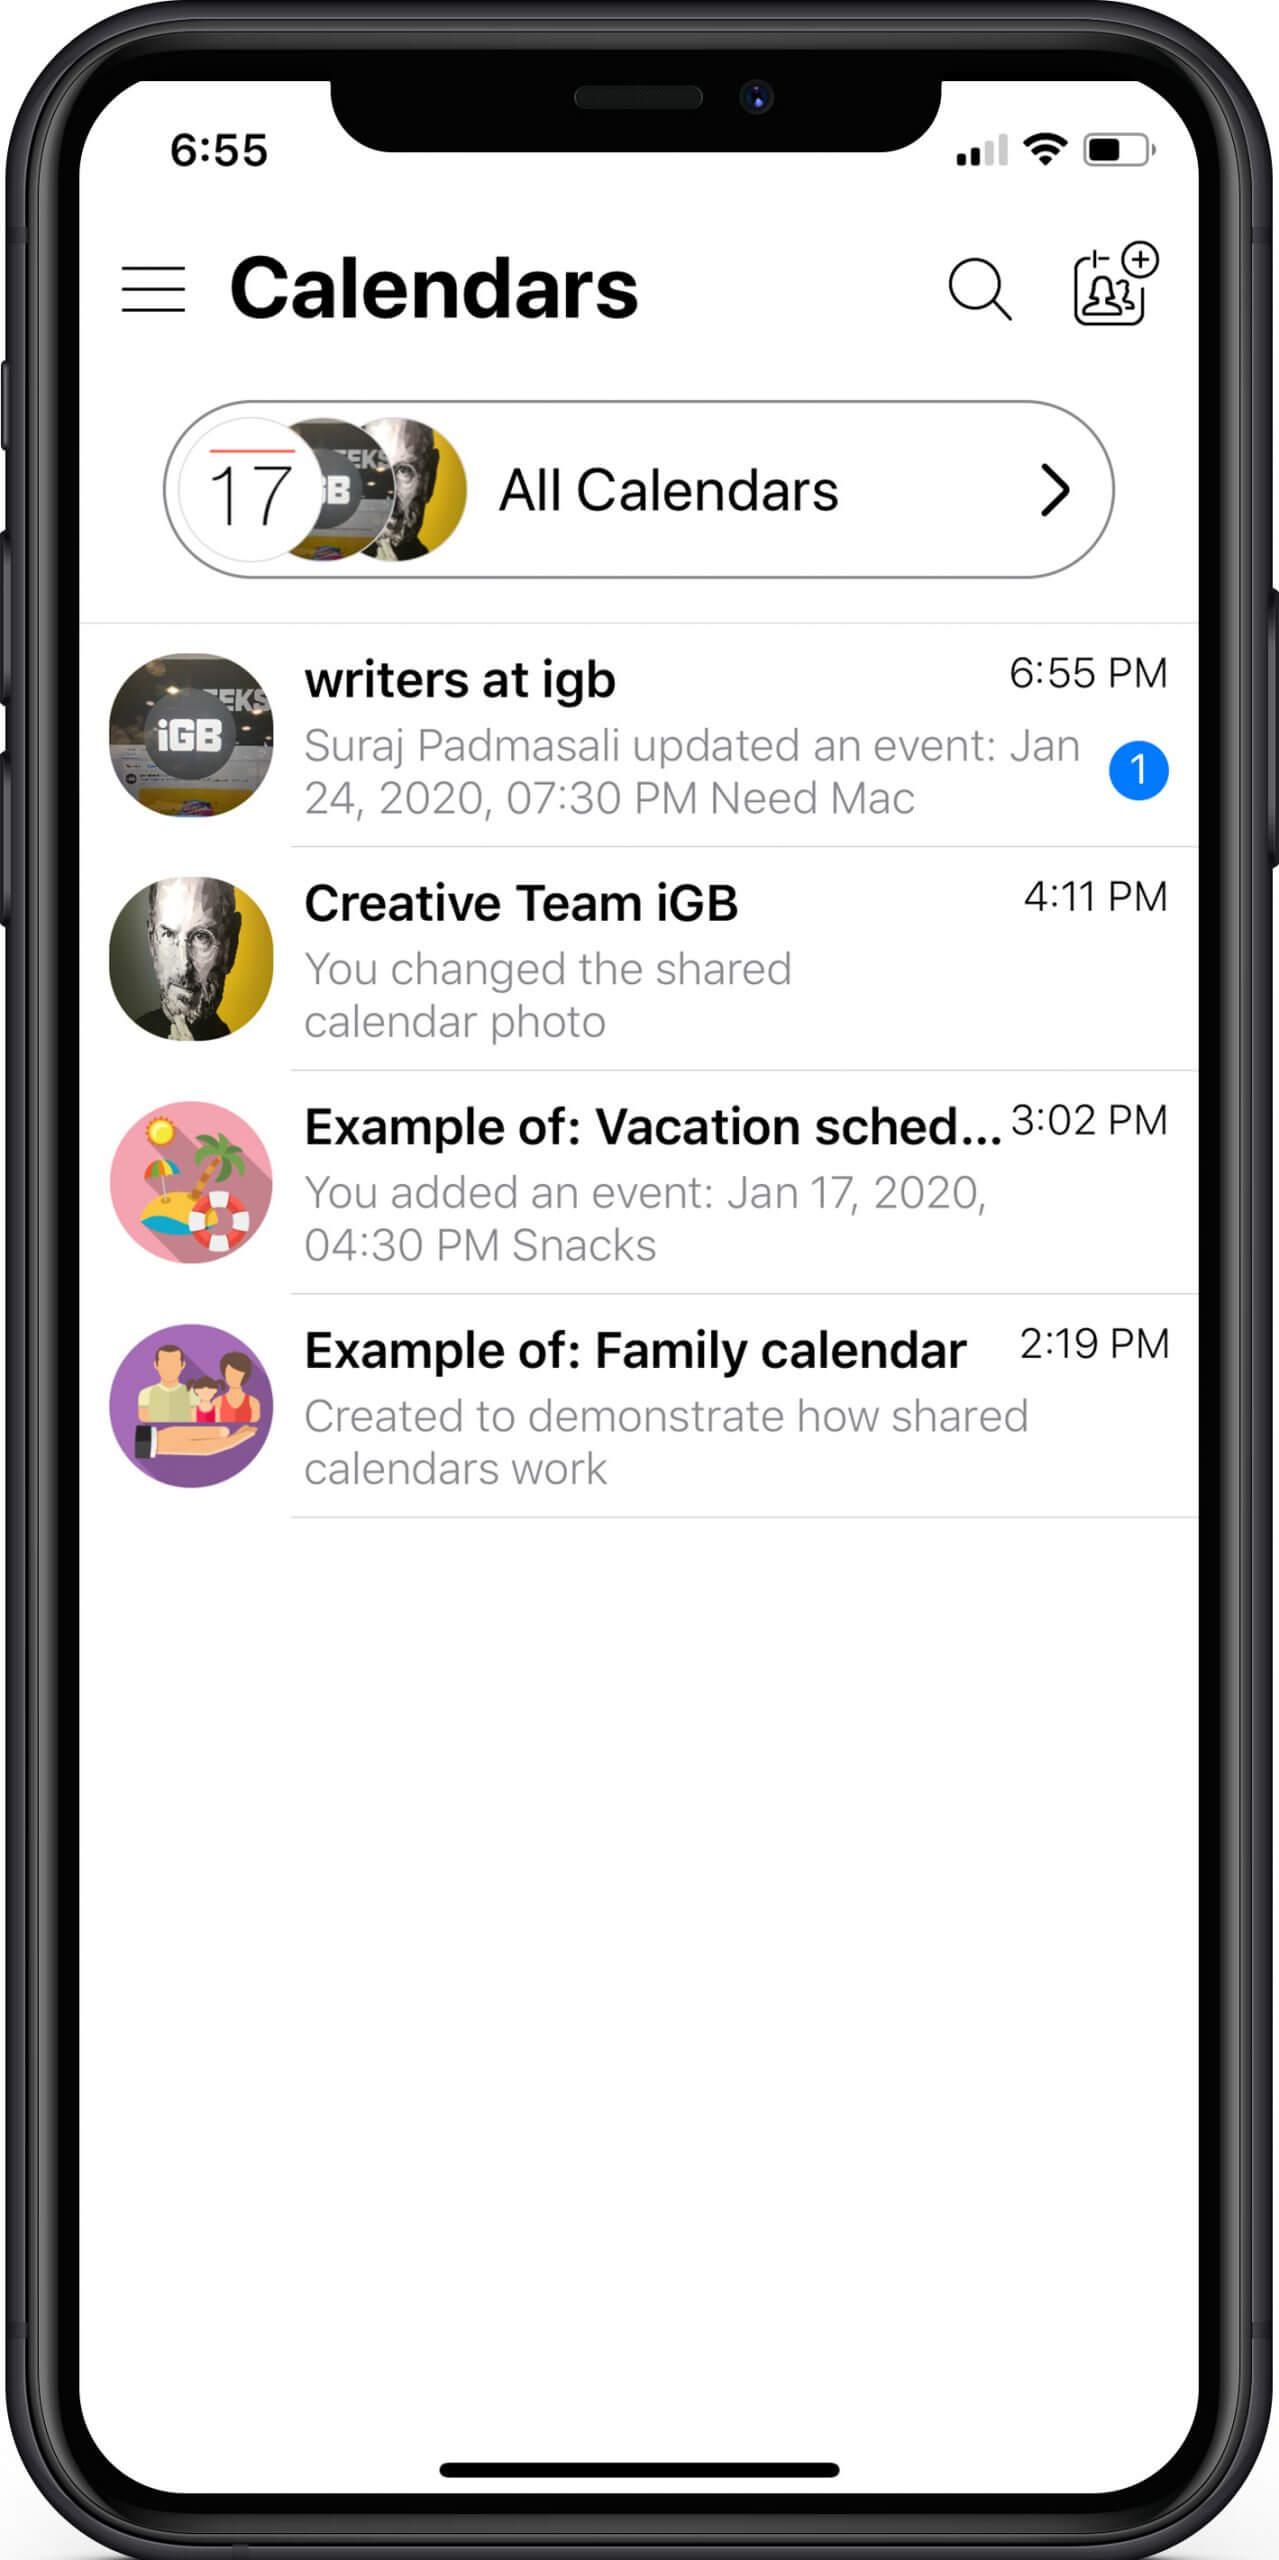 Create Multiple Calendars in GroupCal App on iPhone